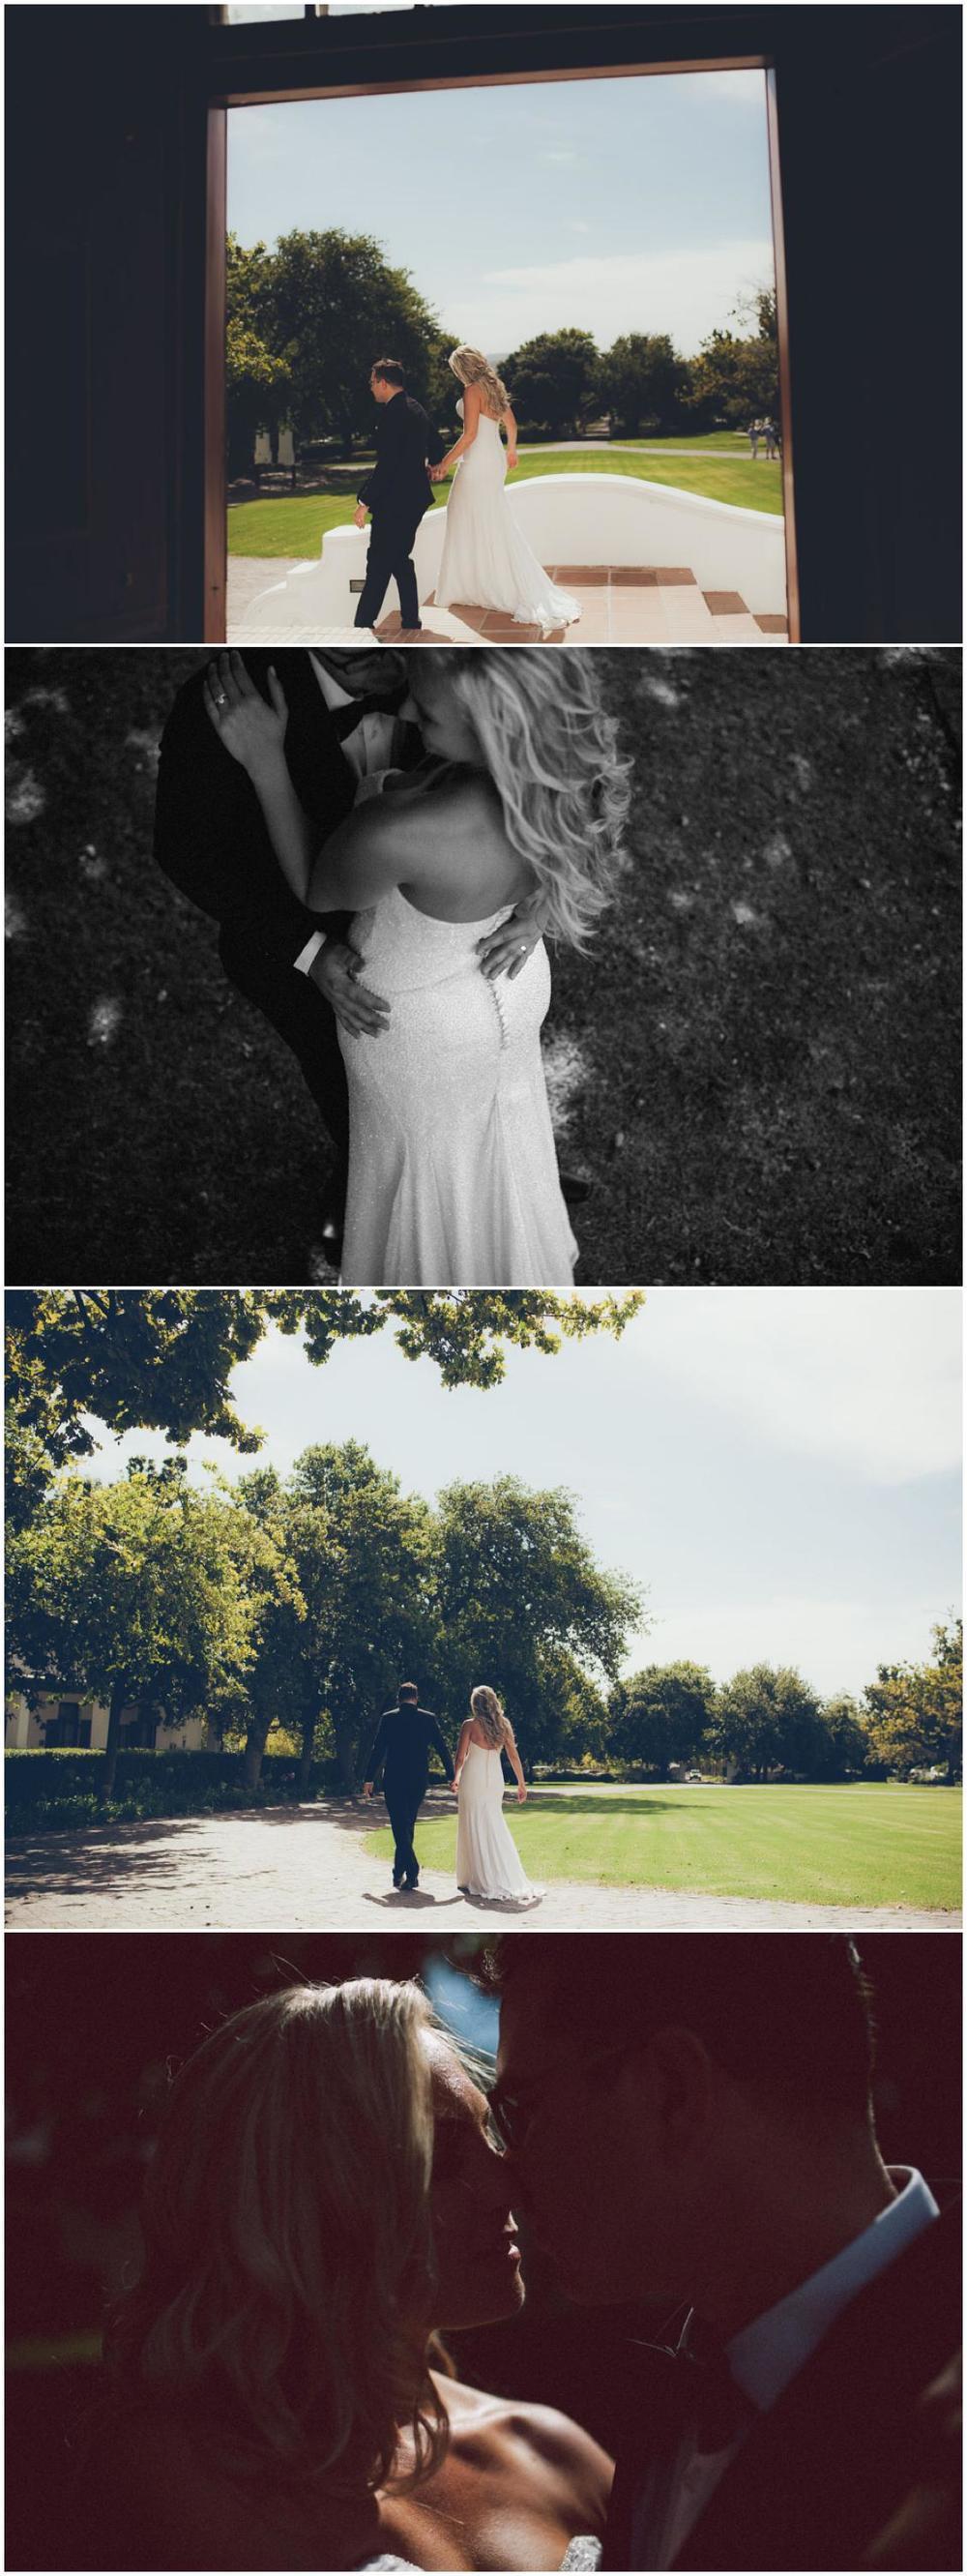 Janlo&Anina_Lanzeraz_Fionaclairphotography-146.jpg